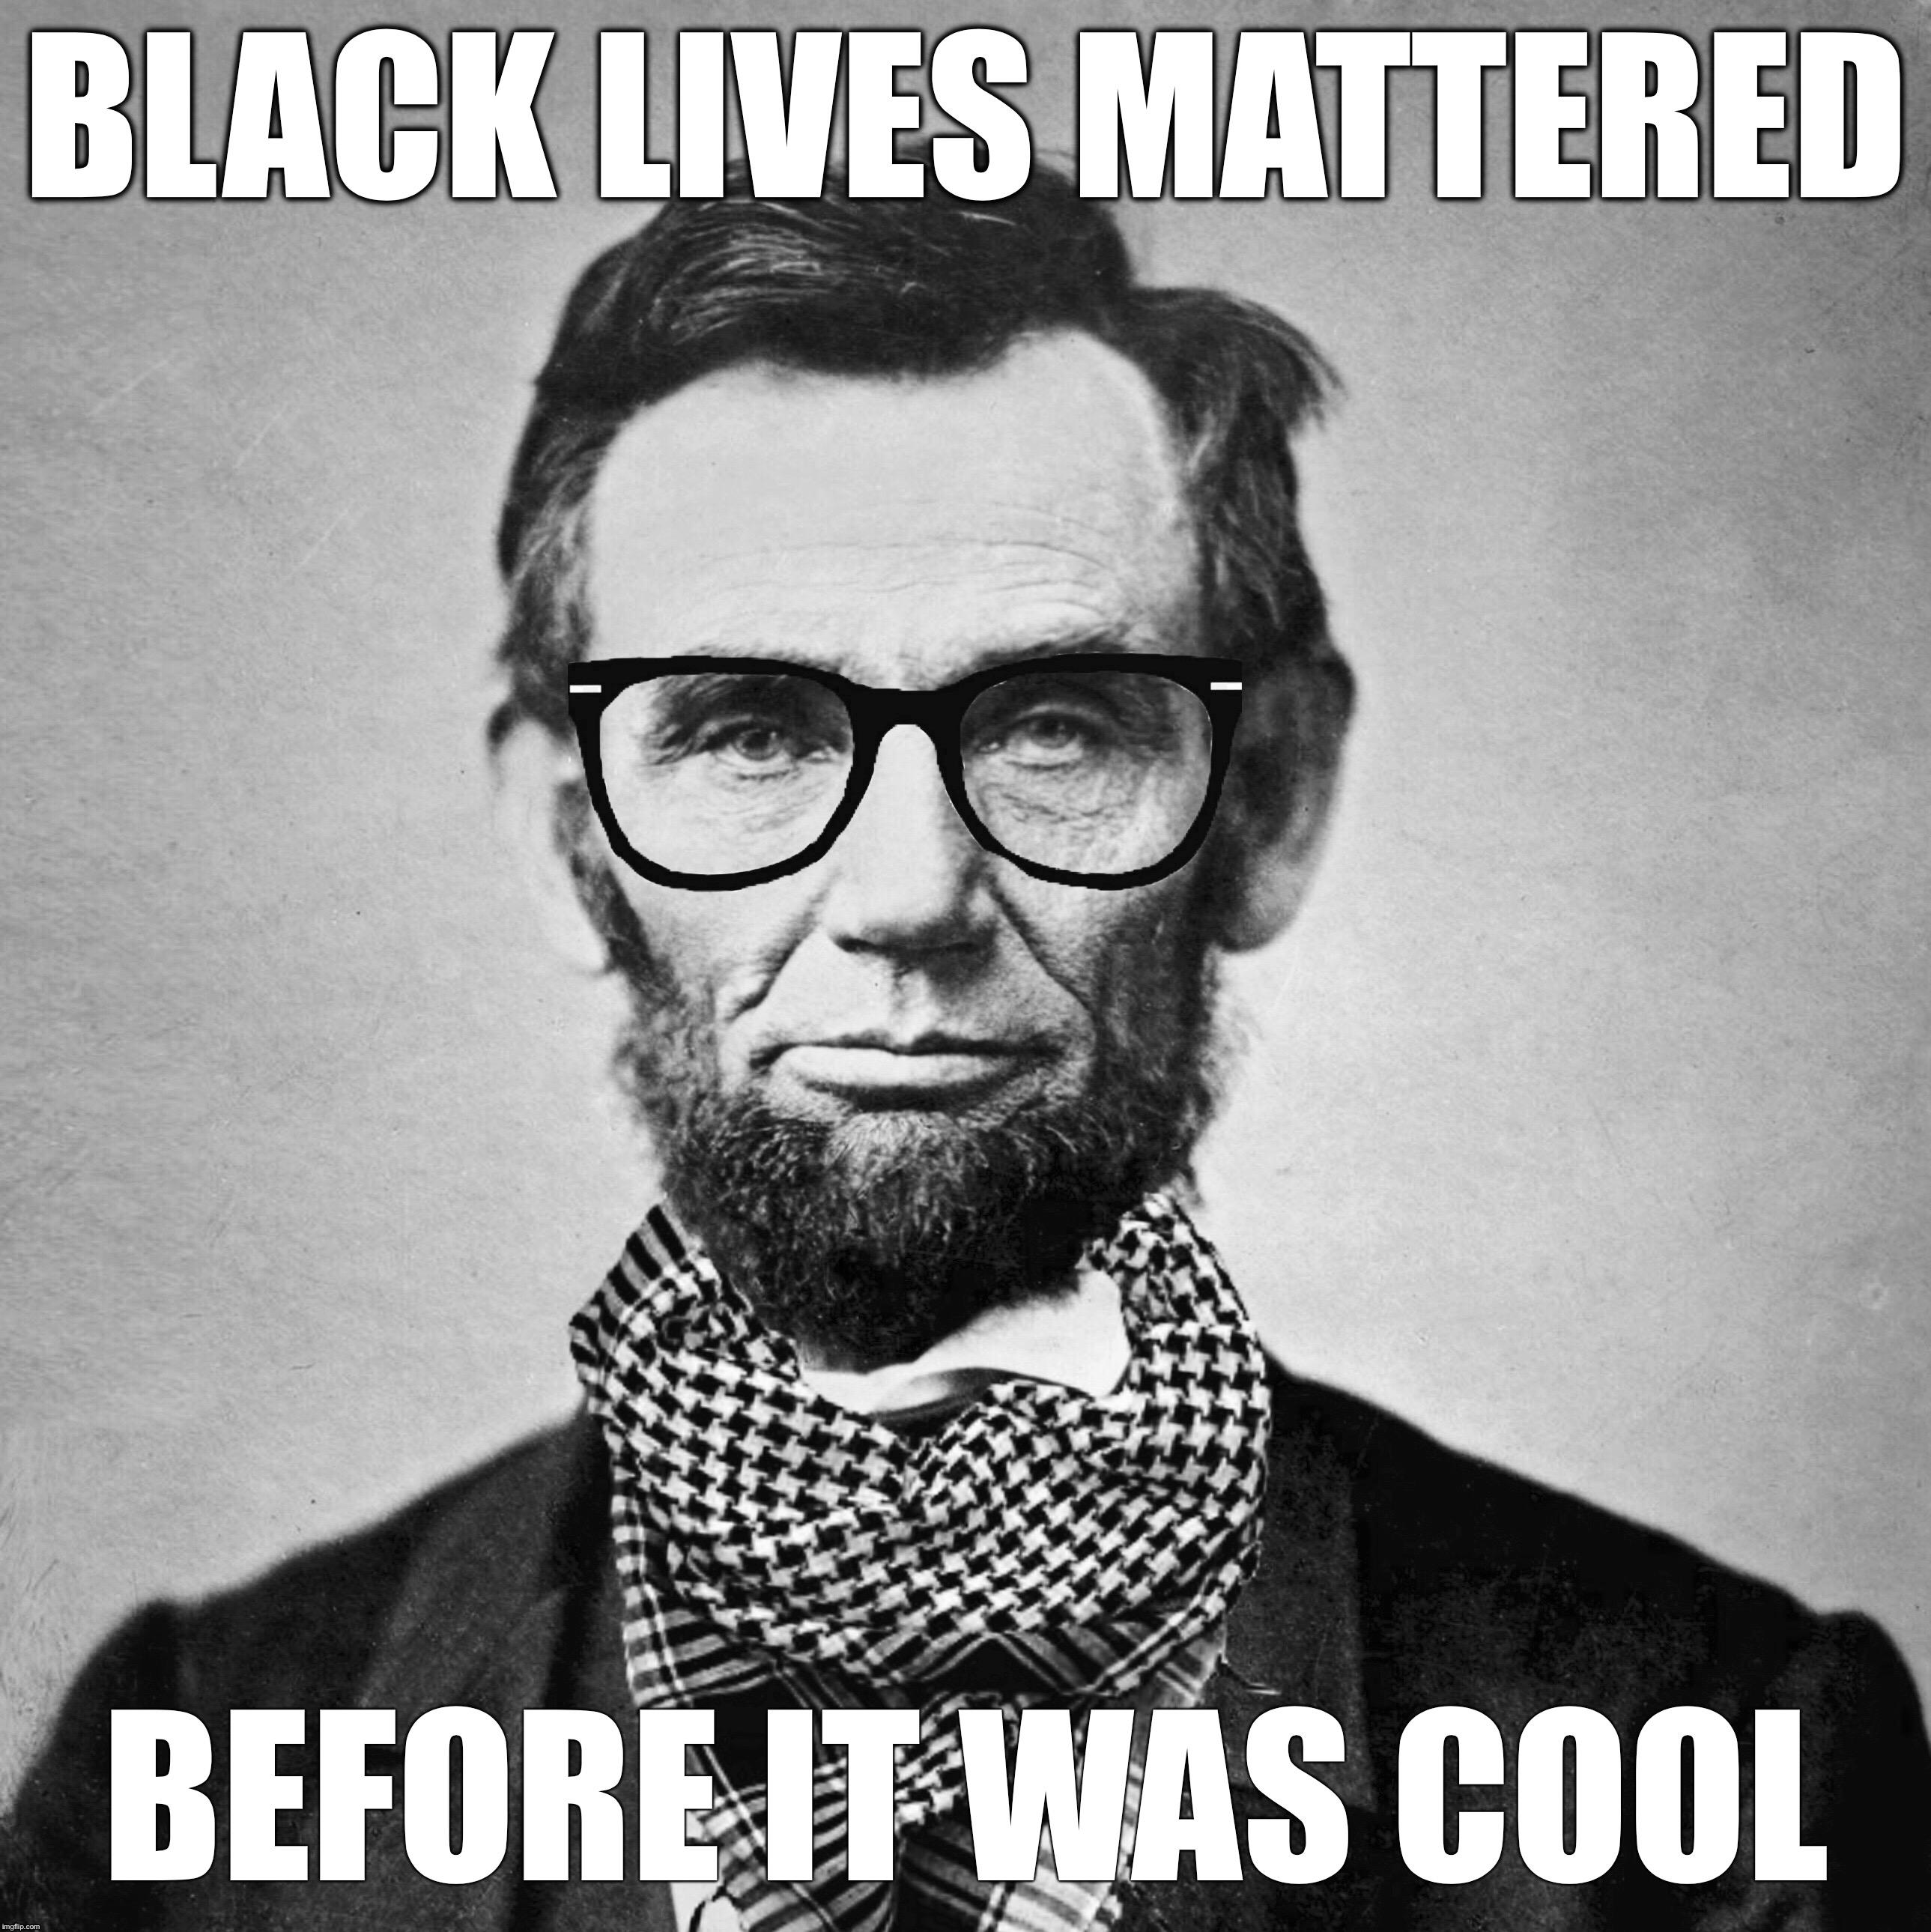 Sjw Abe Lincoln Says Imgflip